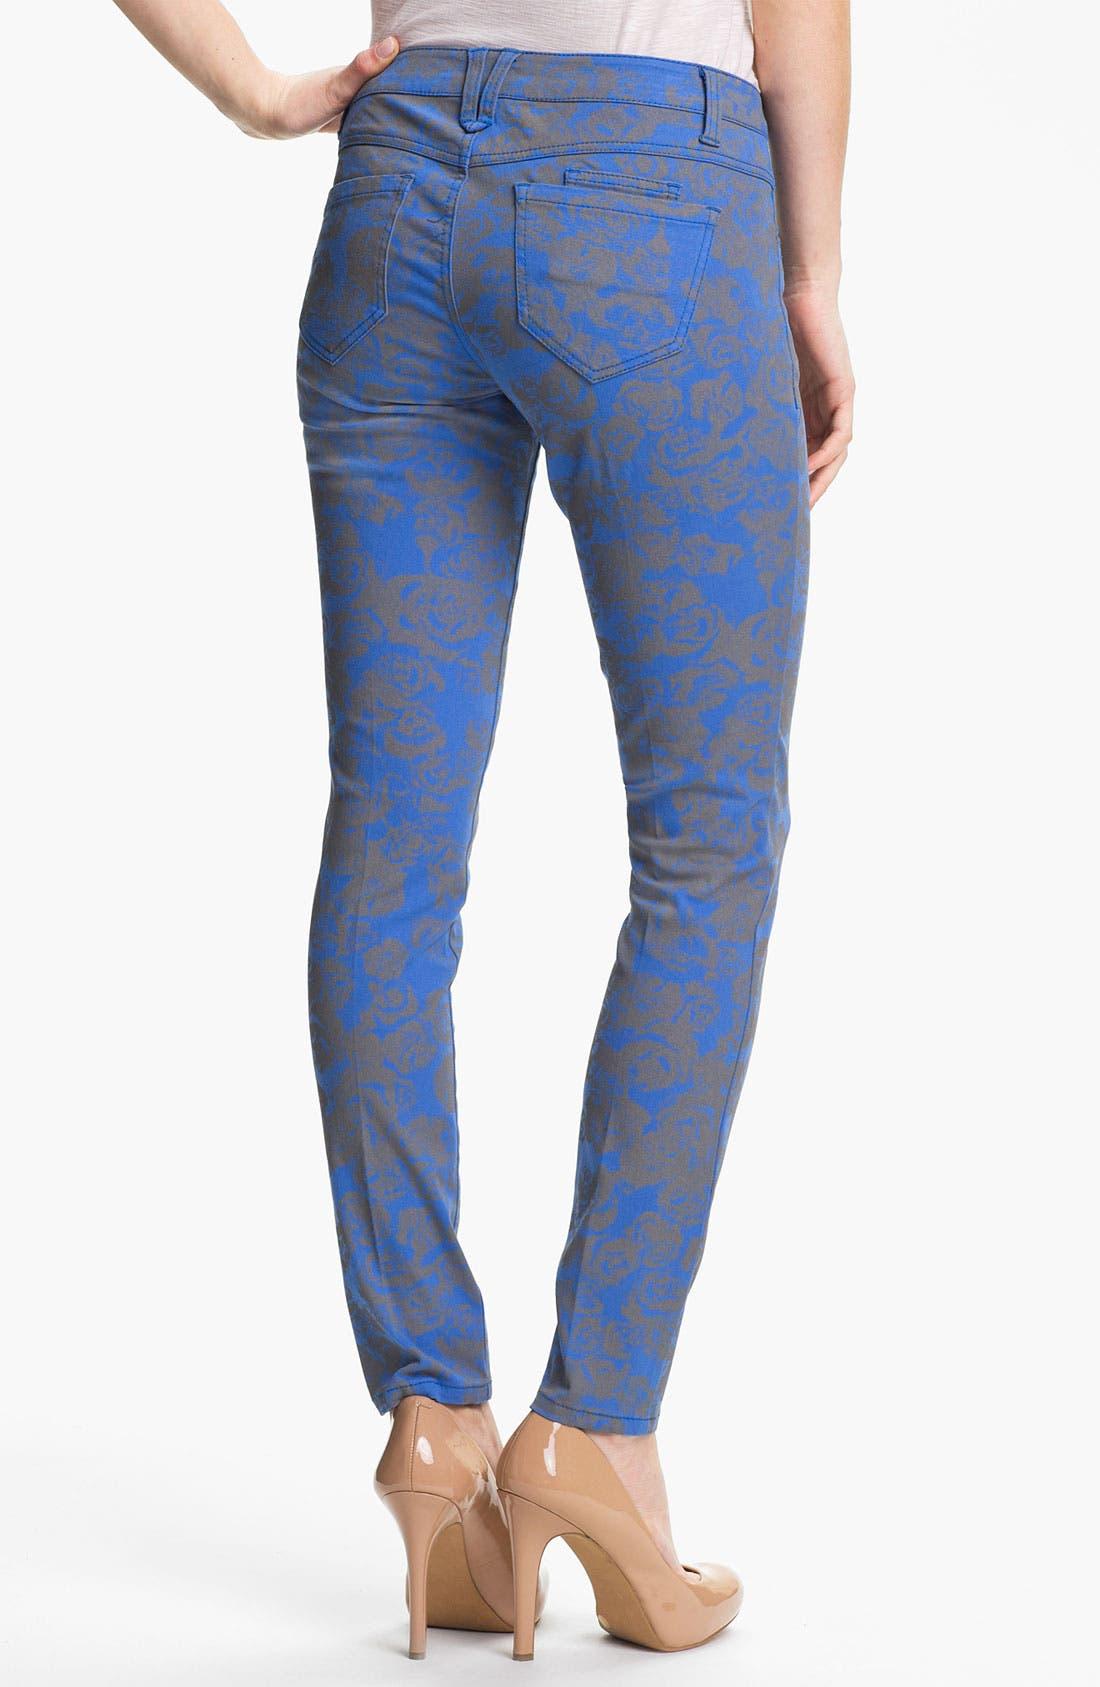 Alternate Image 2  - Wit & Wisdom Floral Print Skinny Jeans (Indigo) (Nordstrom Exclusive)